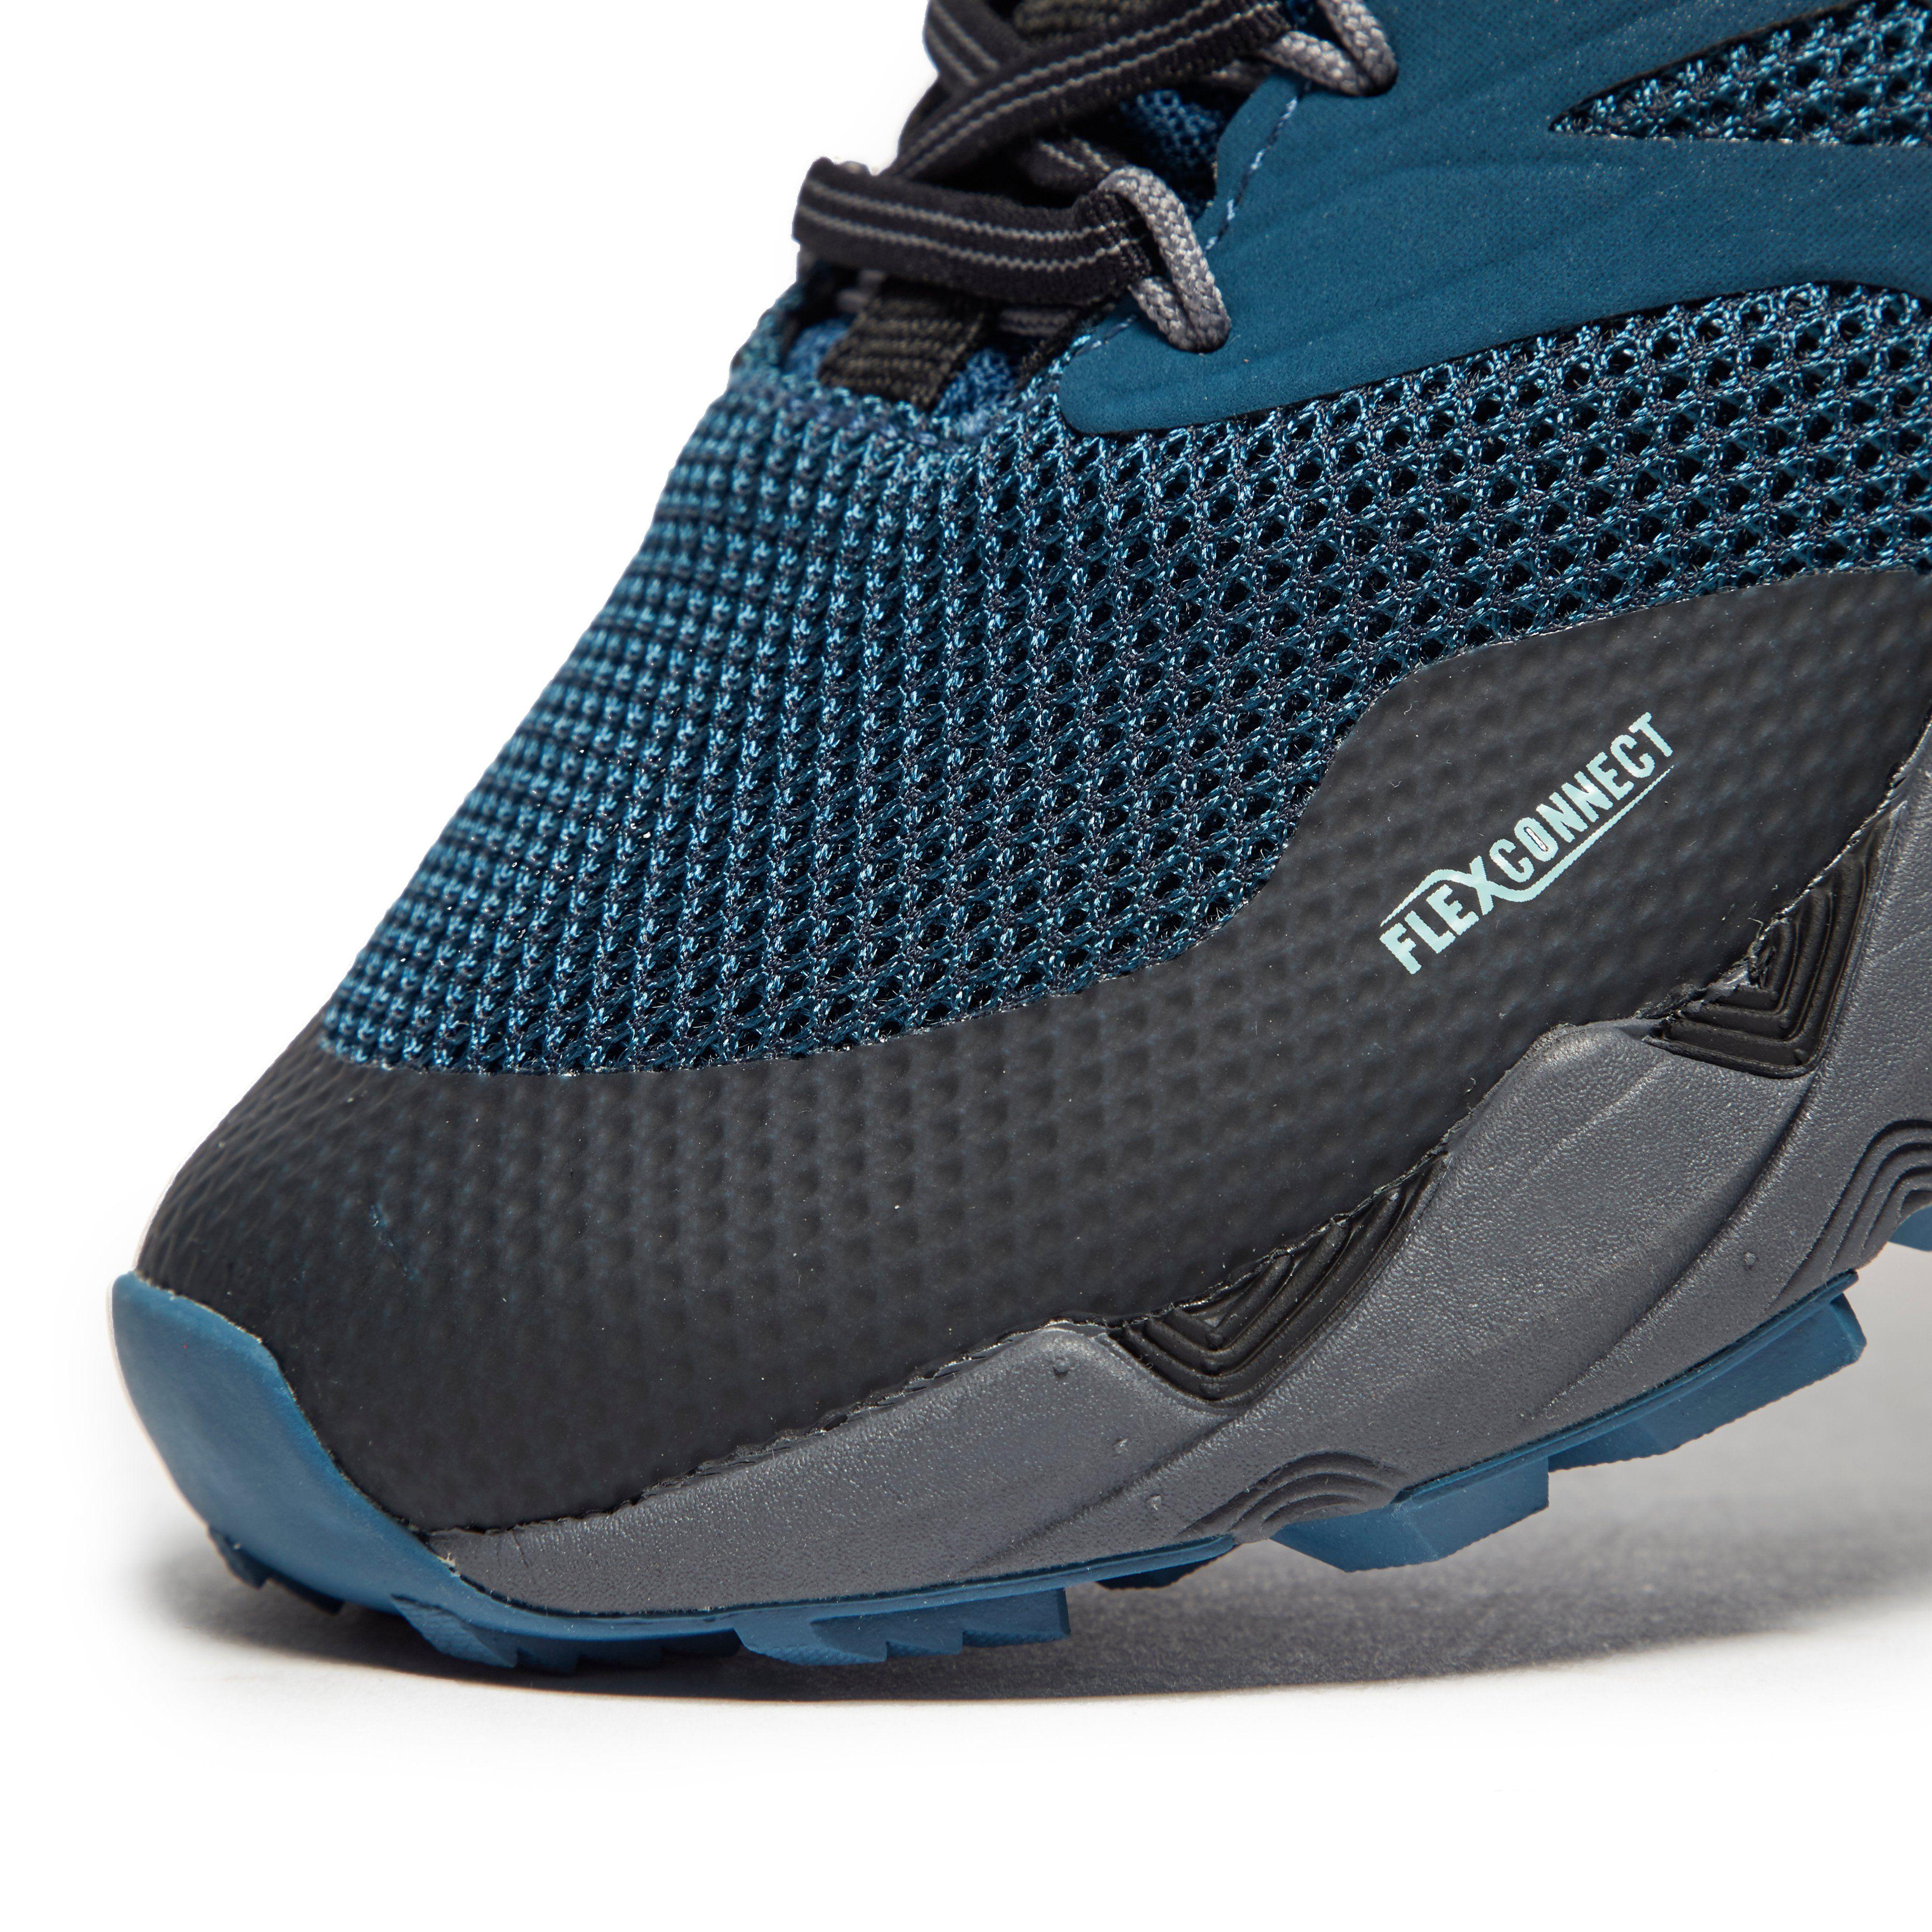 Merrell Agility Peak Flex 2 GTX Men's Trail Running Shoes